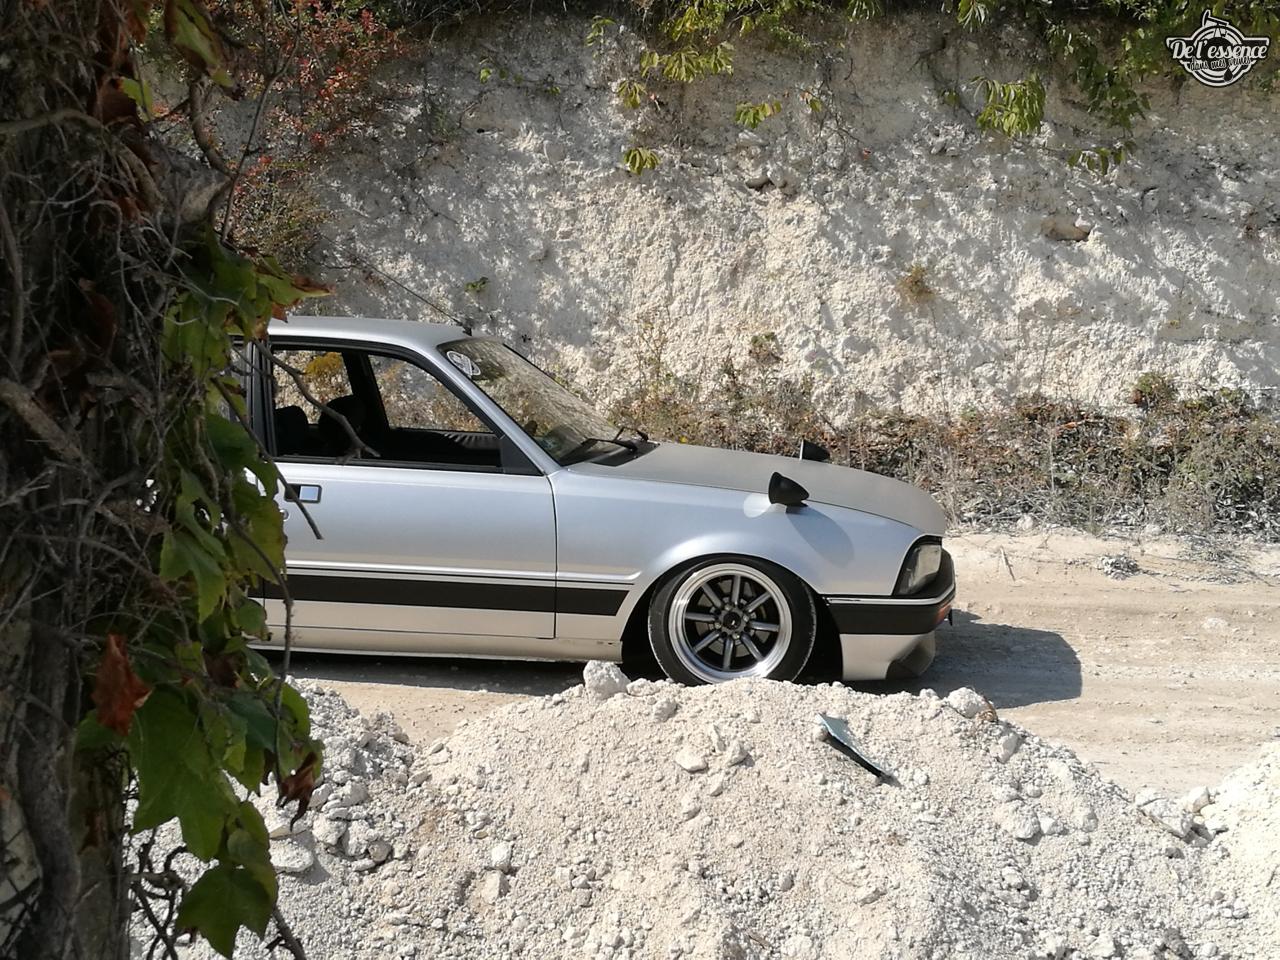 Peugeot 505 Slammed - Pug' Life ! 12